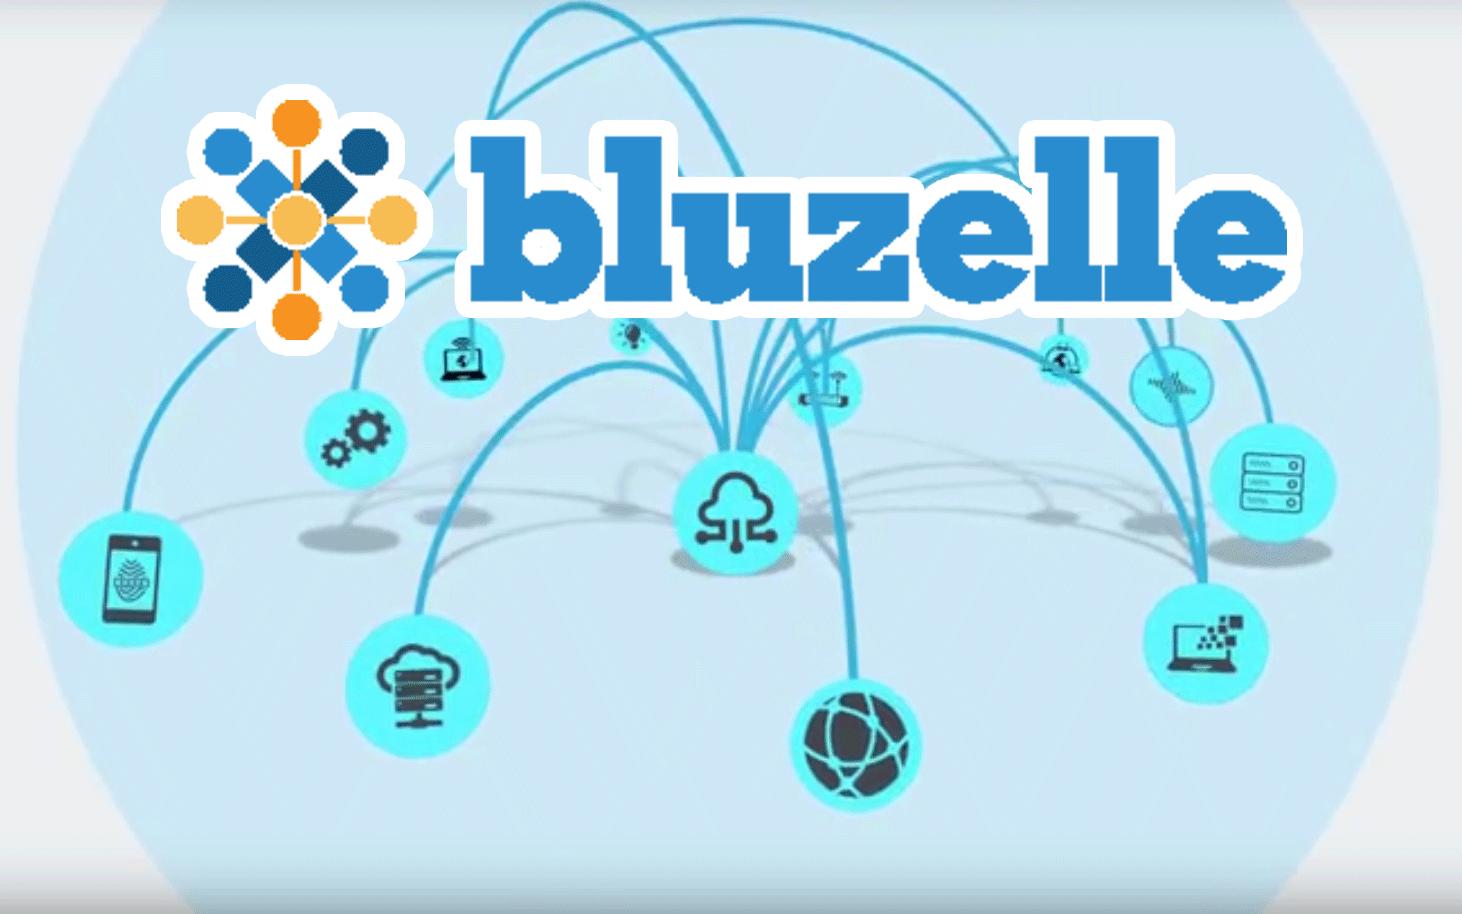 /10-ways-bluzelle-is-building-the-decentralized-internet-1b8439e98108 feature image